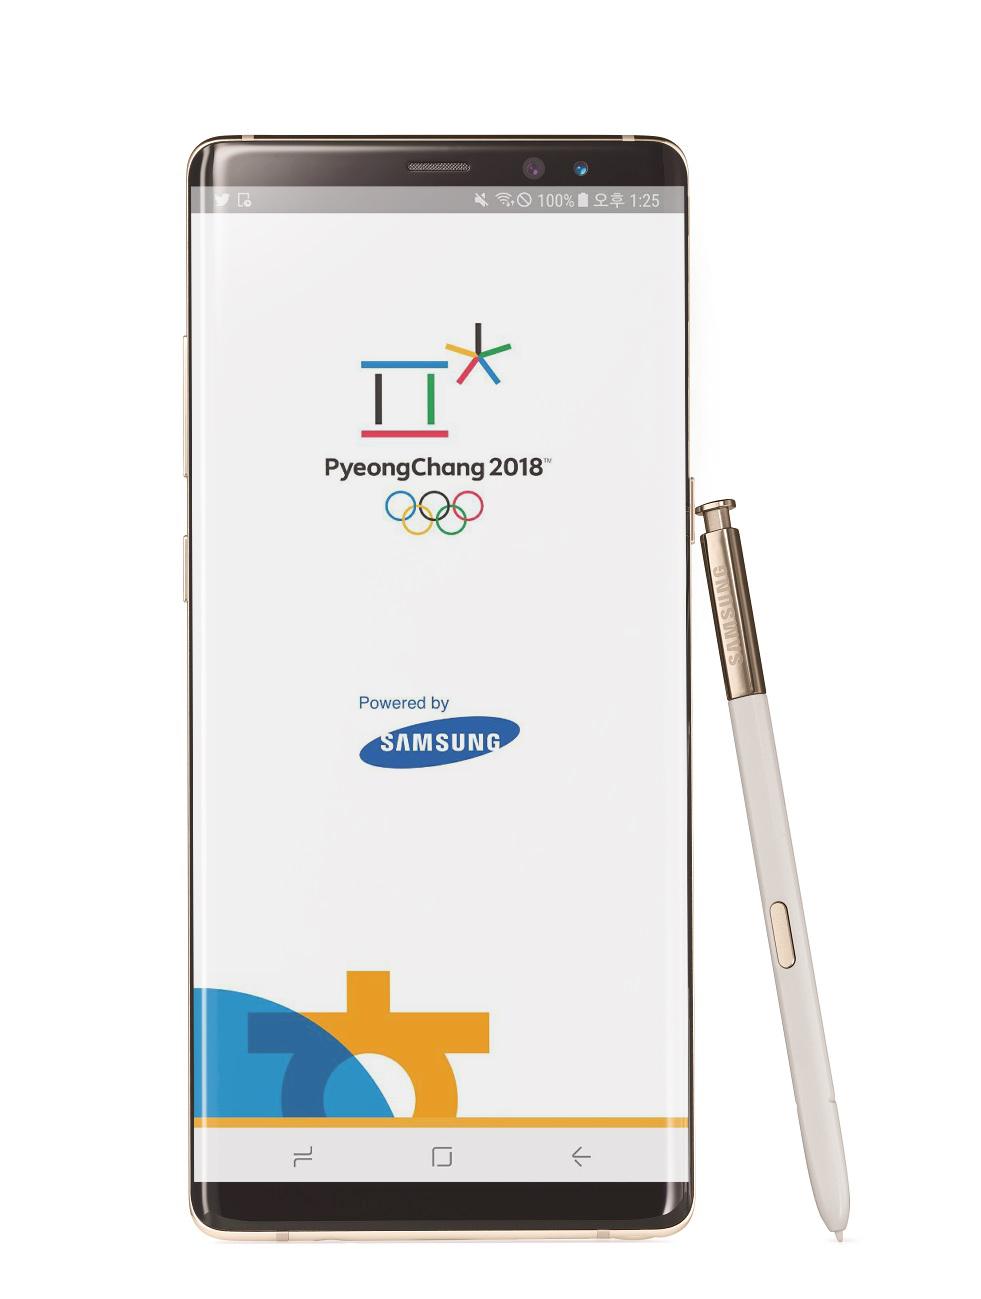 Samsung's official PyeongChang 2018 app brings you closer ...